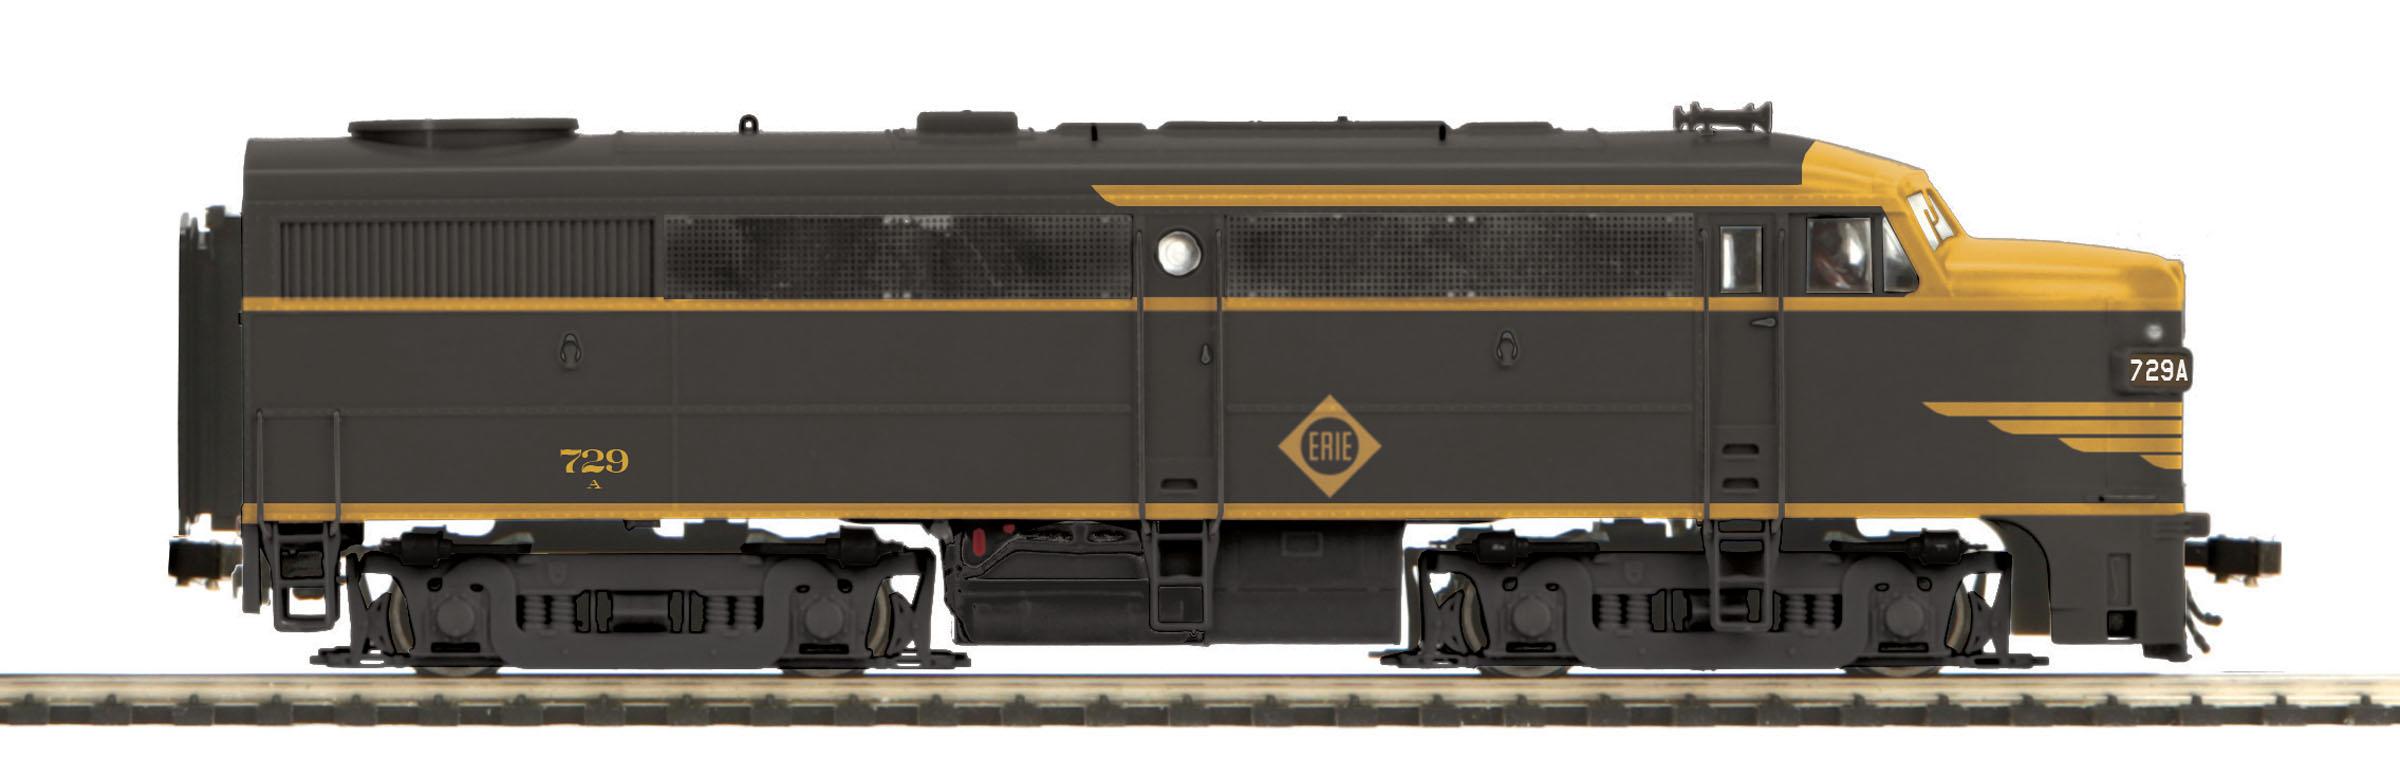 80-2213-1